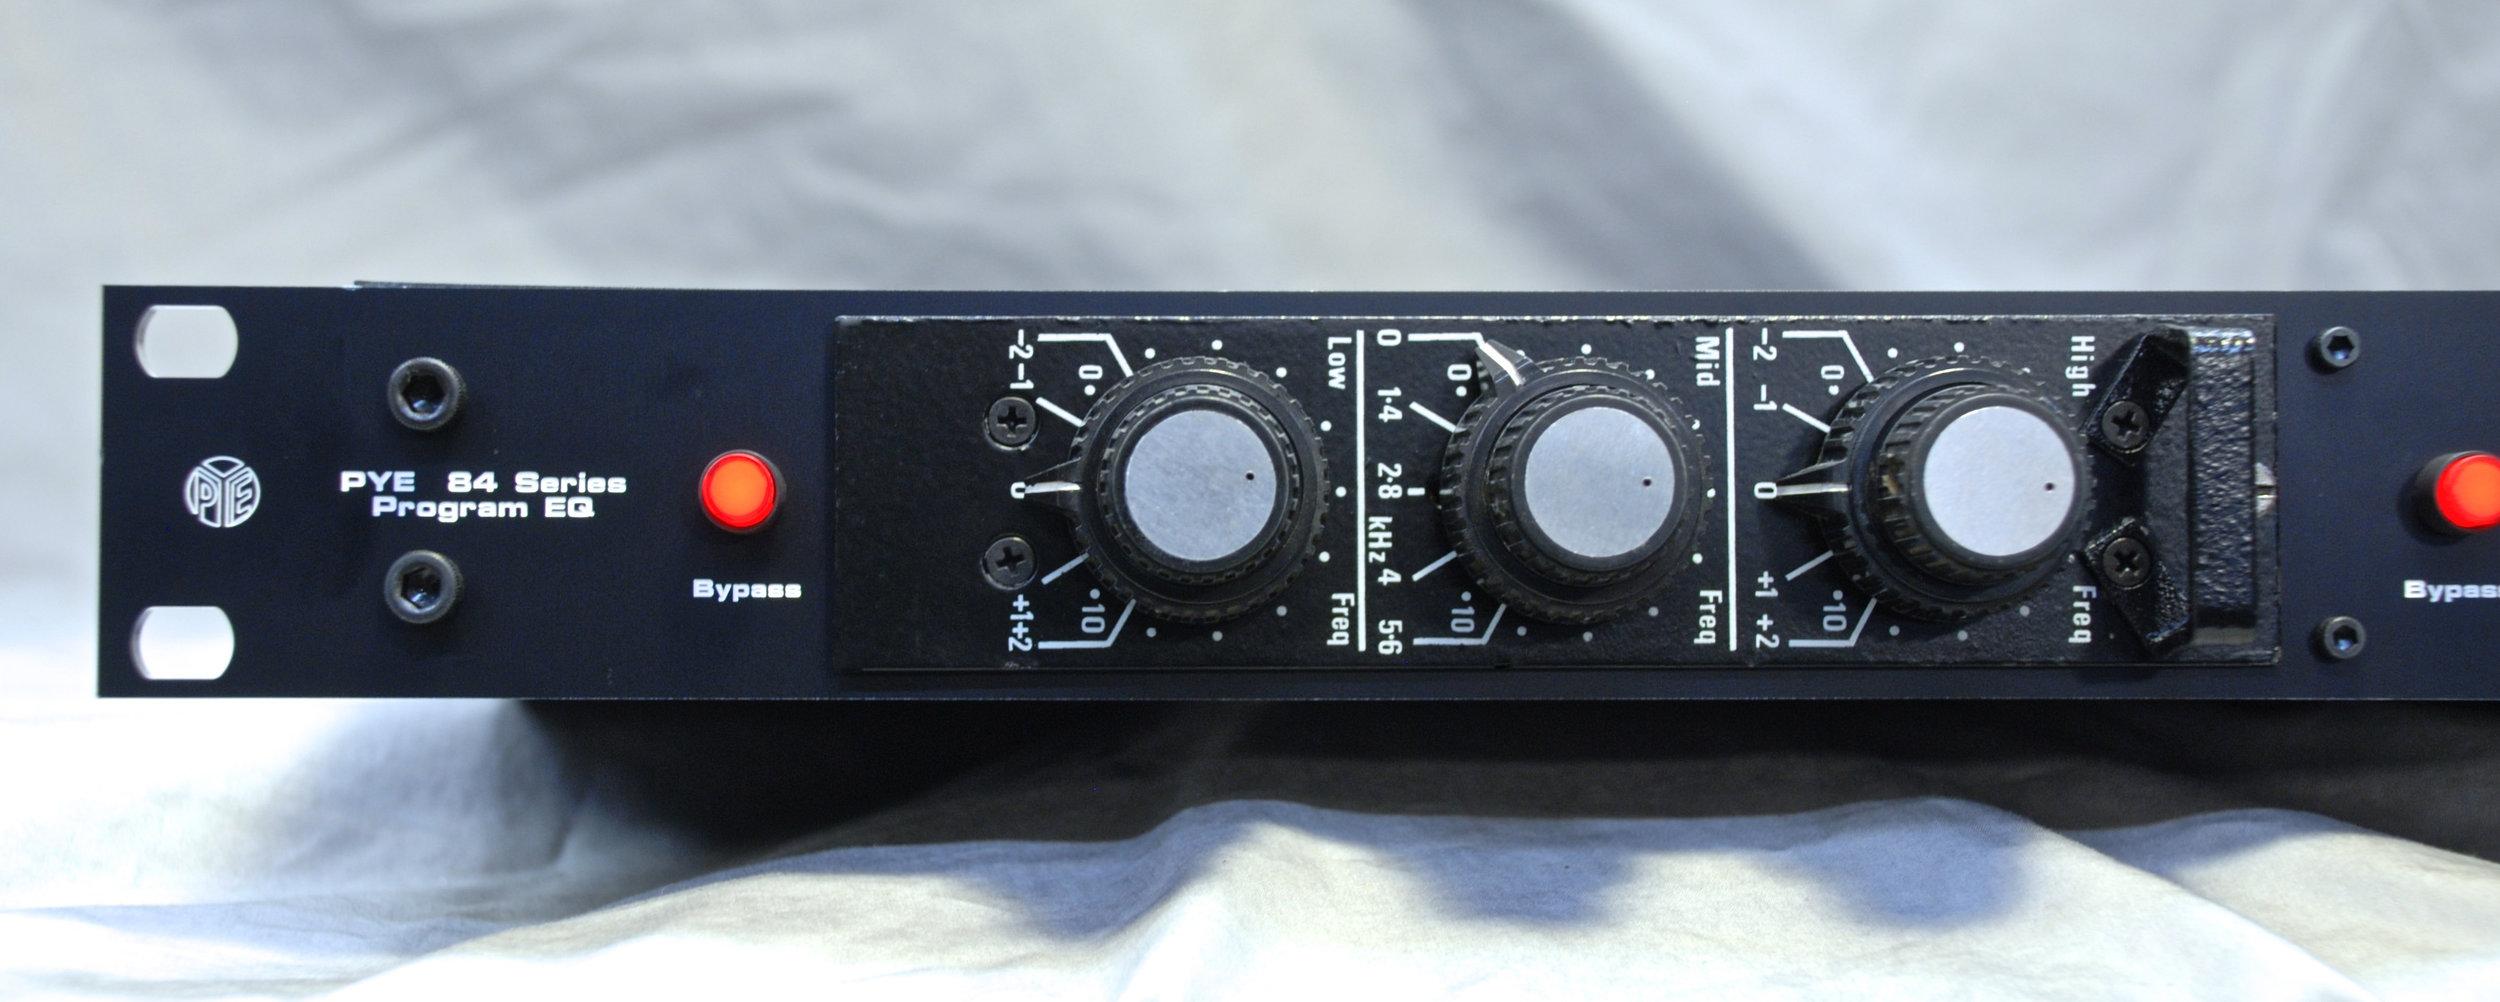 PYE 84 Series EQ LHS.jpg